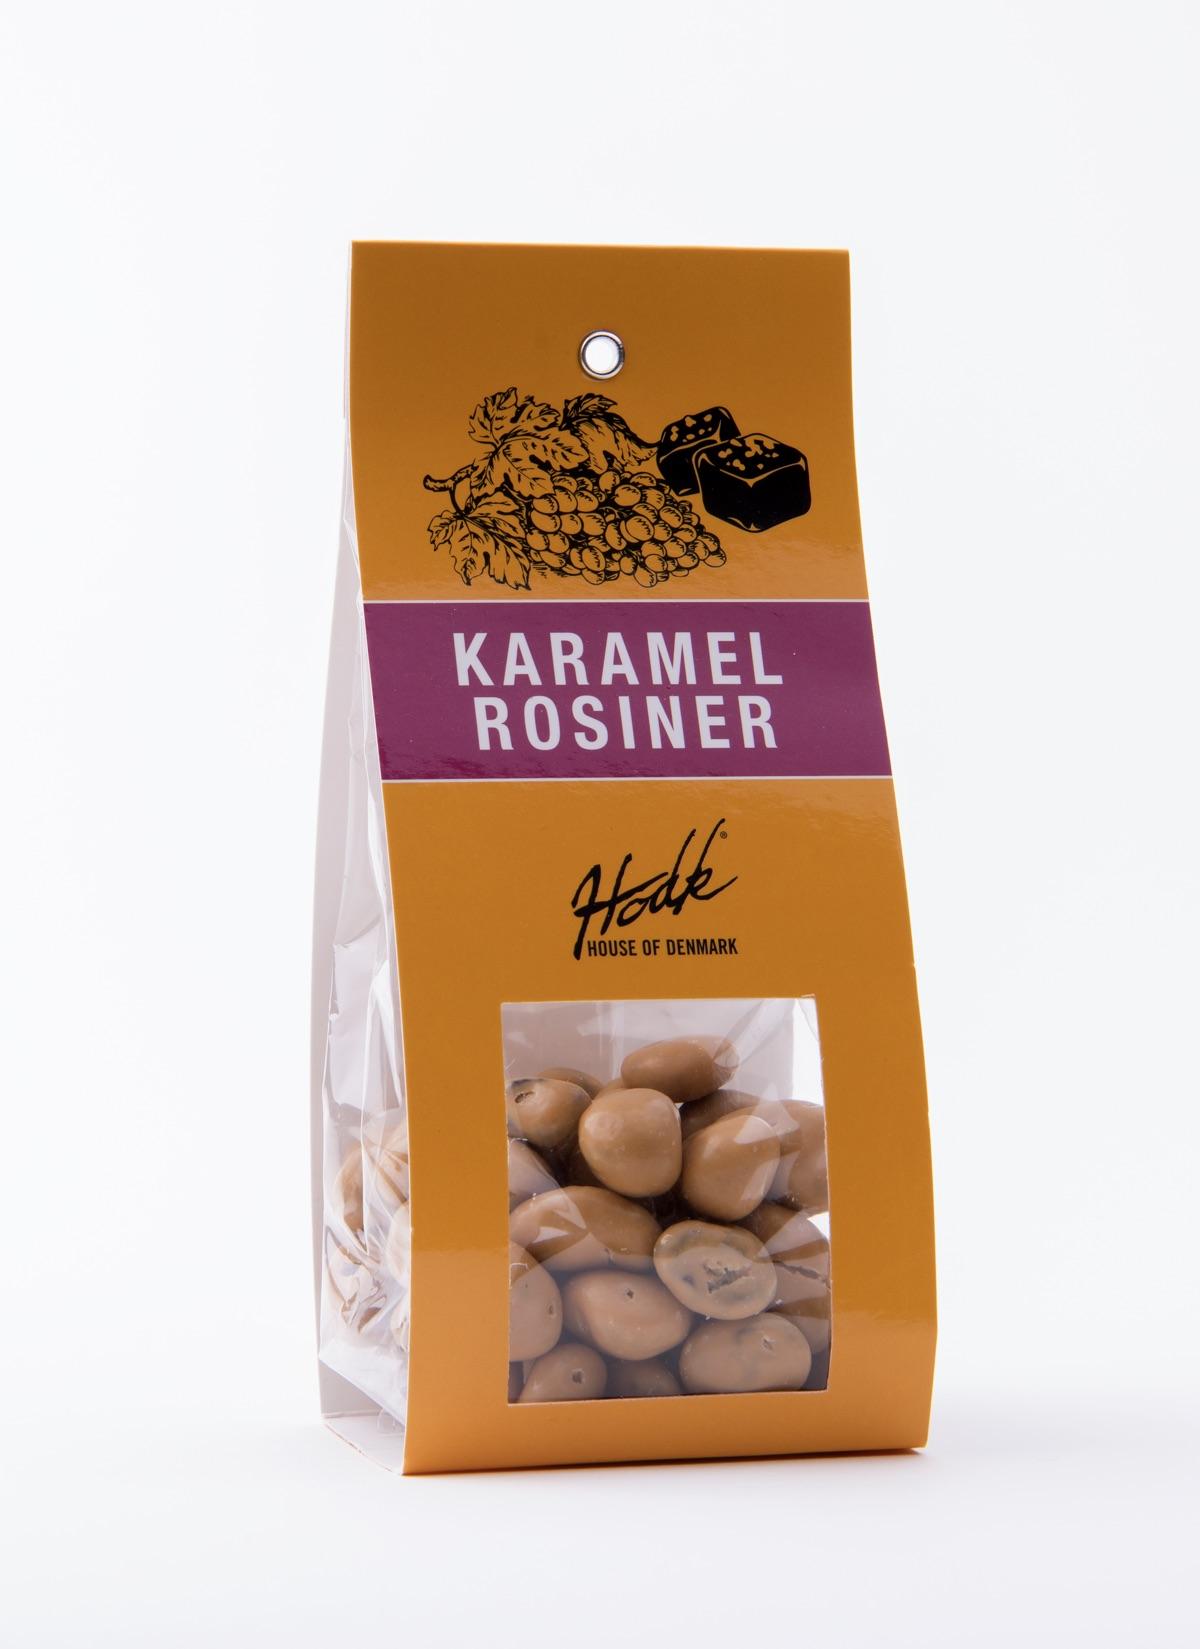 Karamel Rosiner